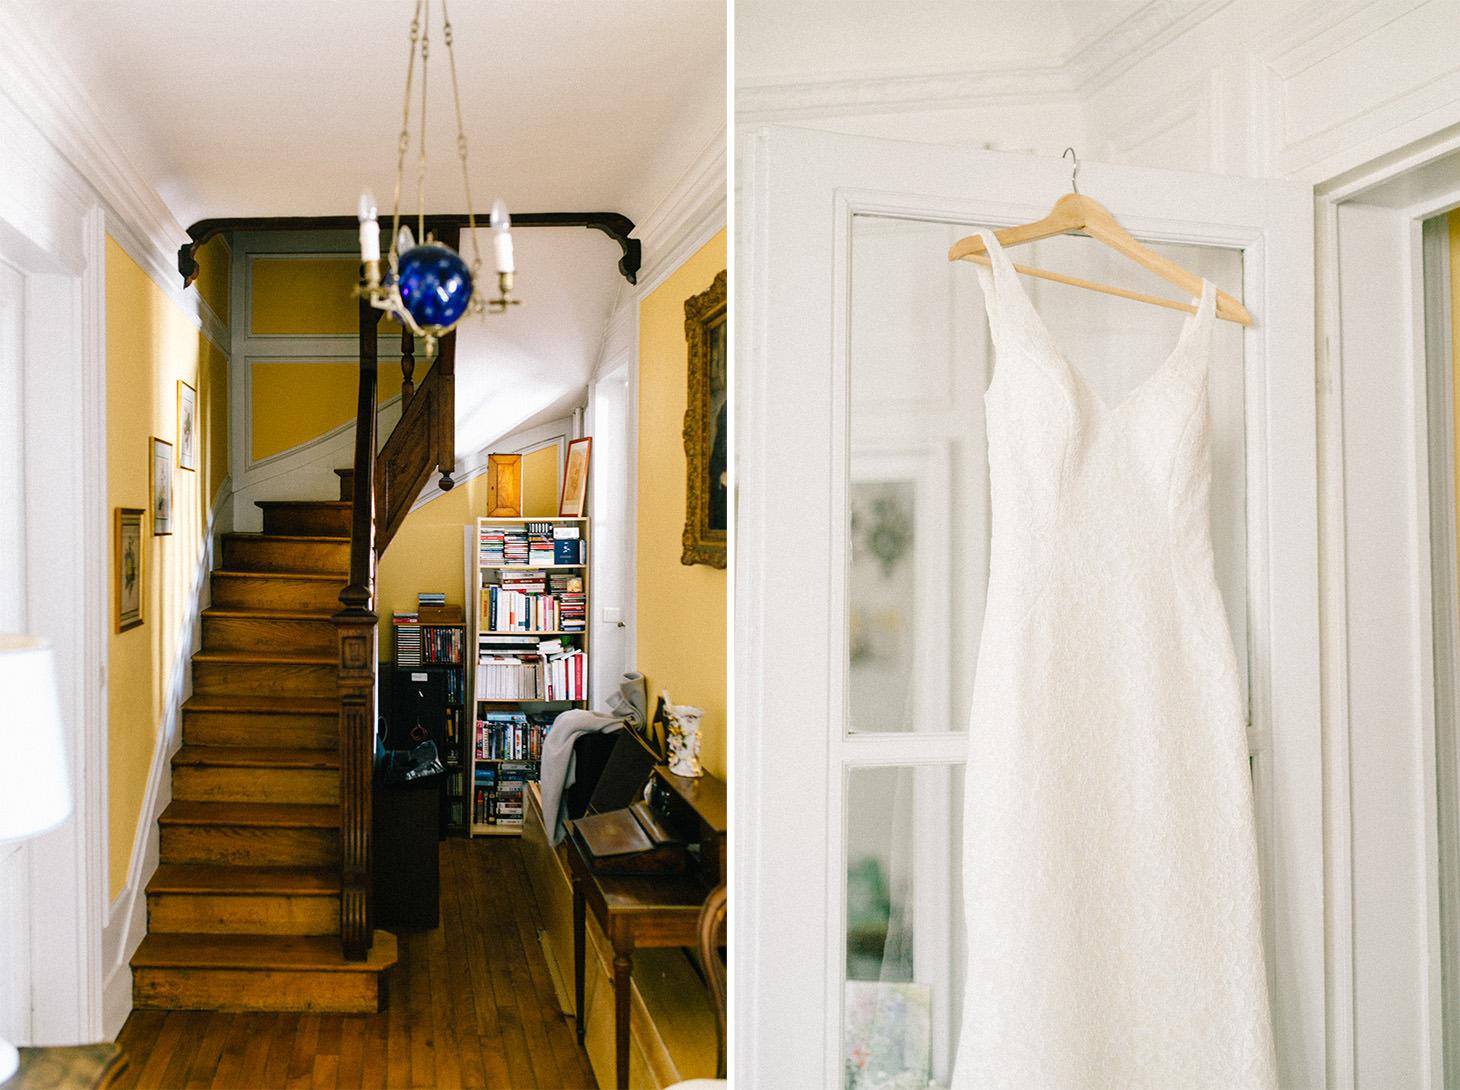 photographe-mariage-paris-montfort-l-amaury-002